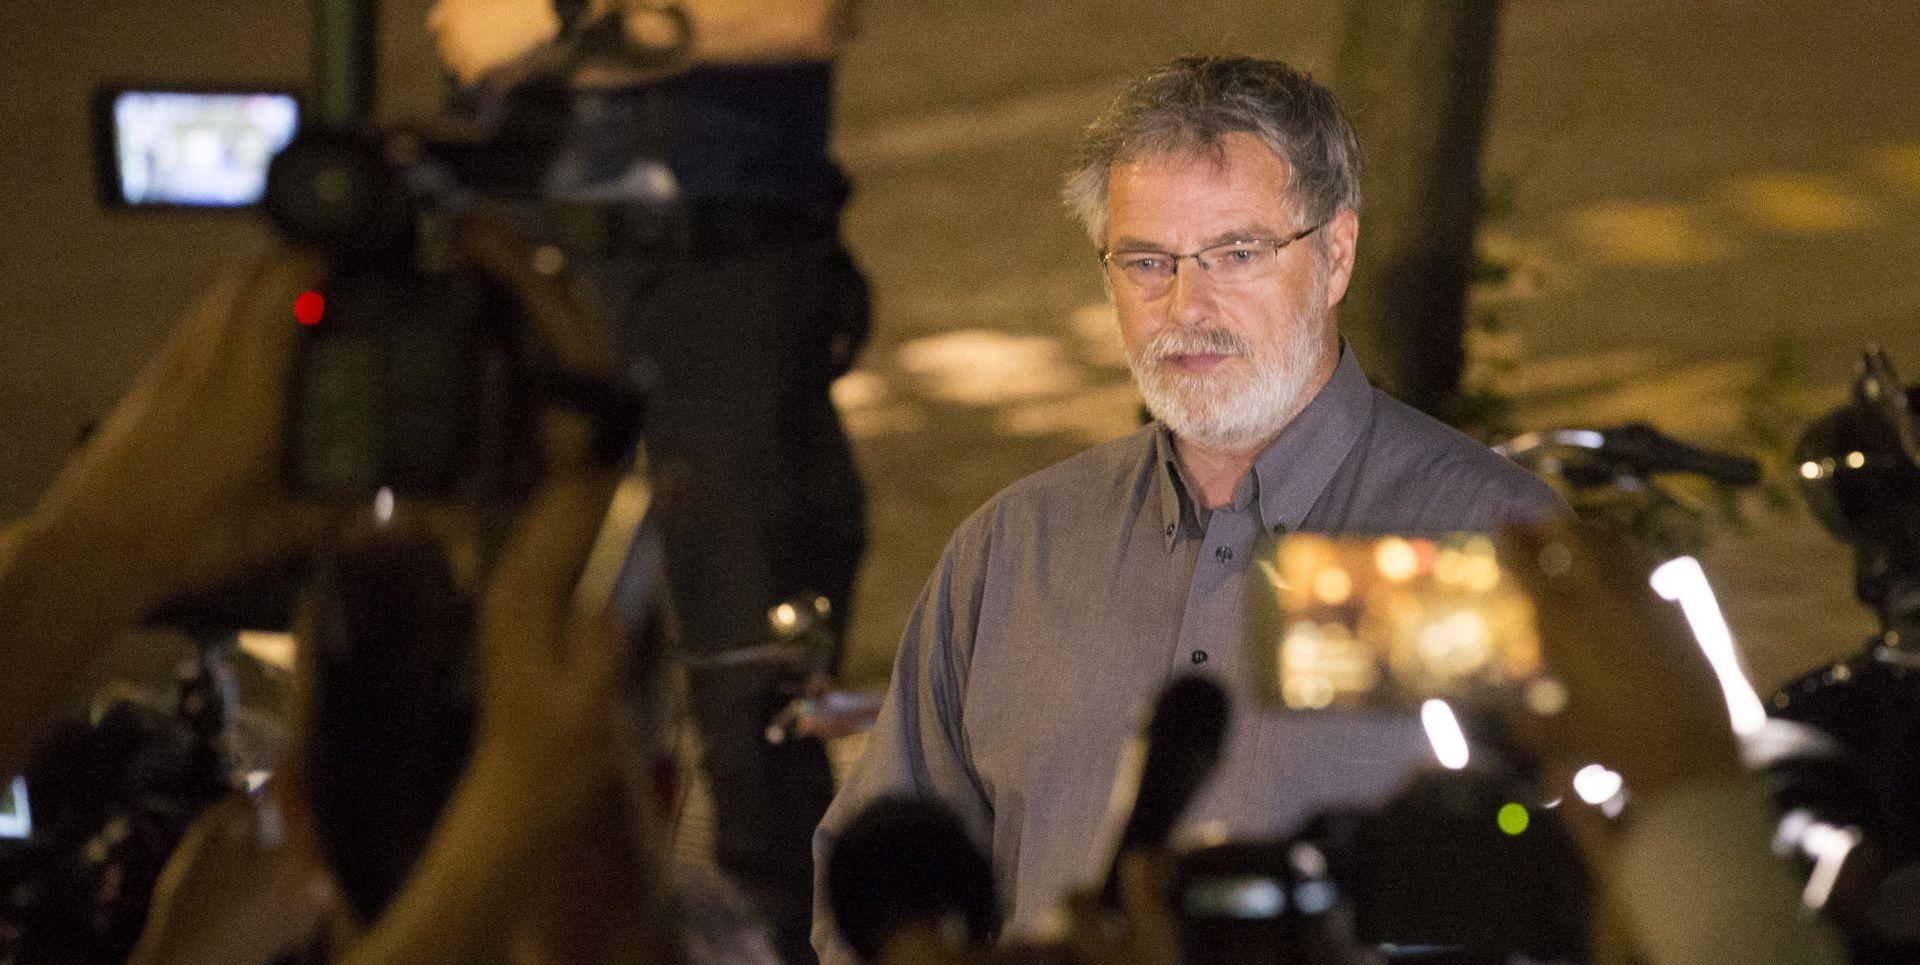 BELGIJSKO DRŽAVNO ODVJETNIŠTVO 'Eksplozija u Bruxellesu je teroristički čin'